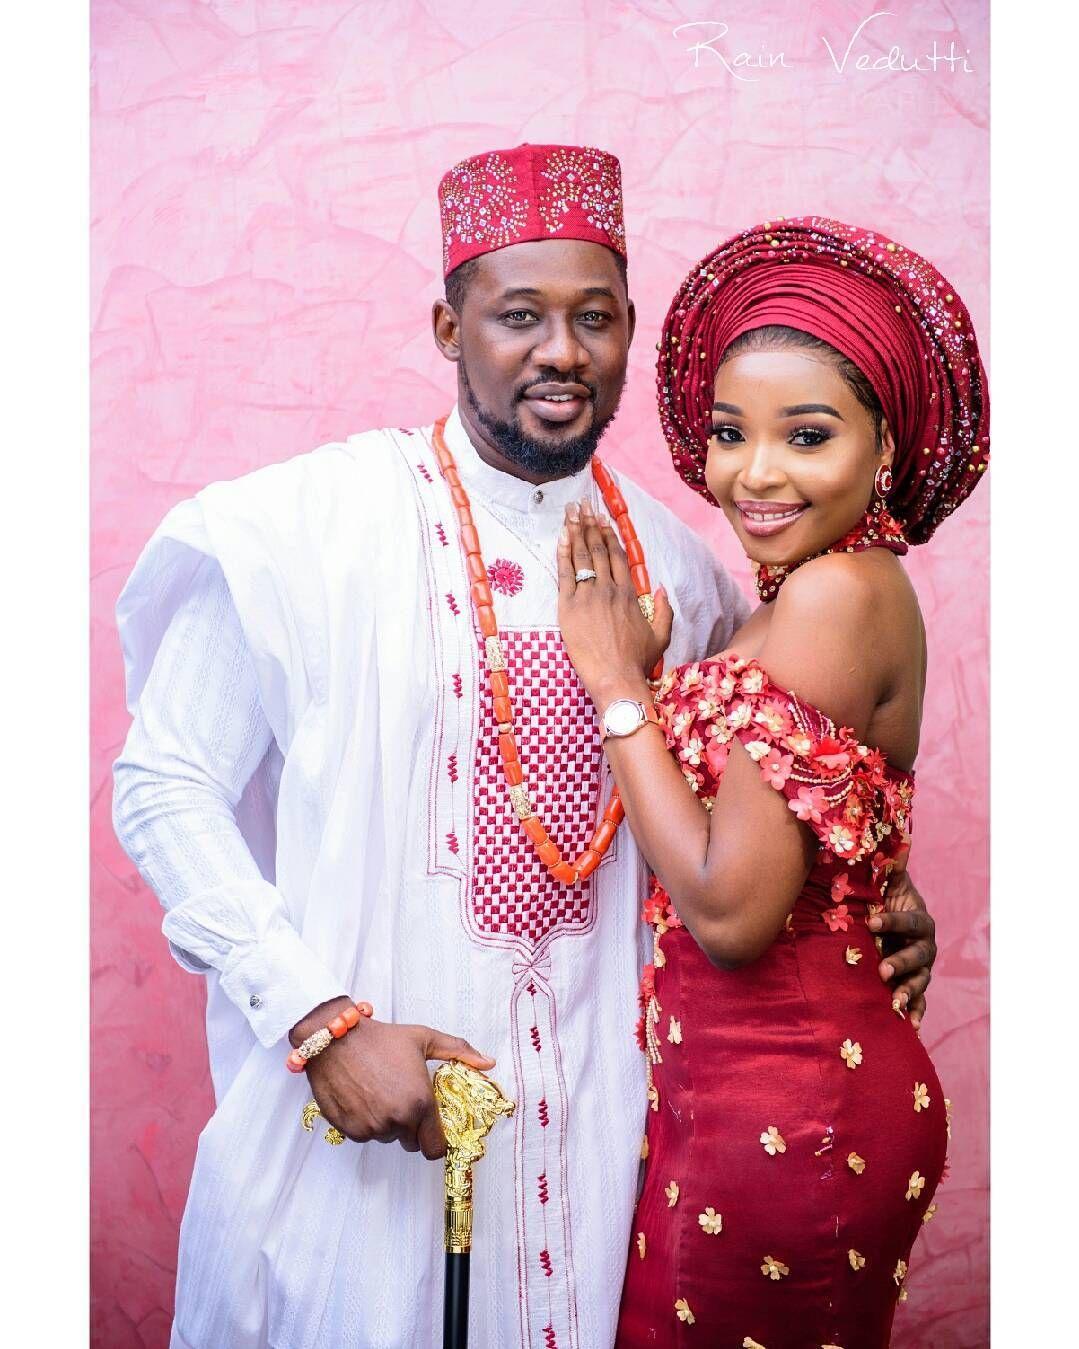 Beautiful Photos From Daniel K Daniels Traditional Marriage   Traditional  wedding attire, Marriage dress for men, Nigerian wedding attire